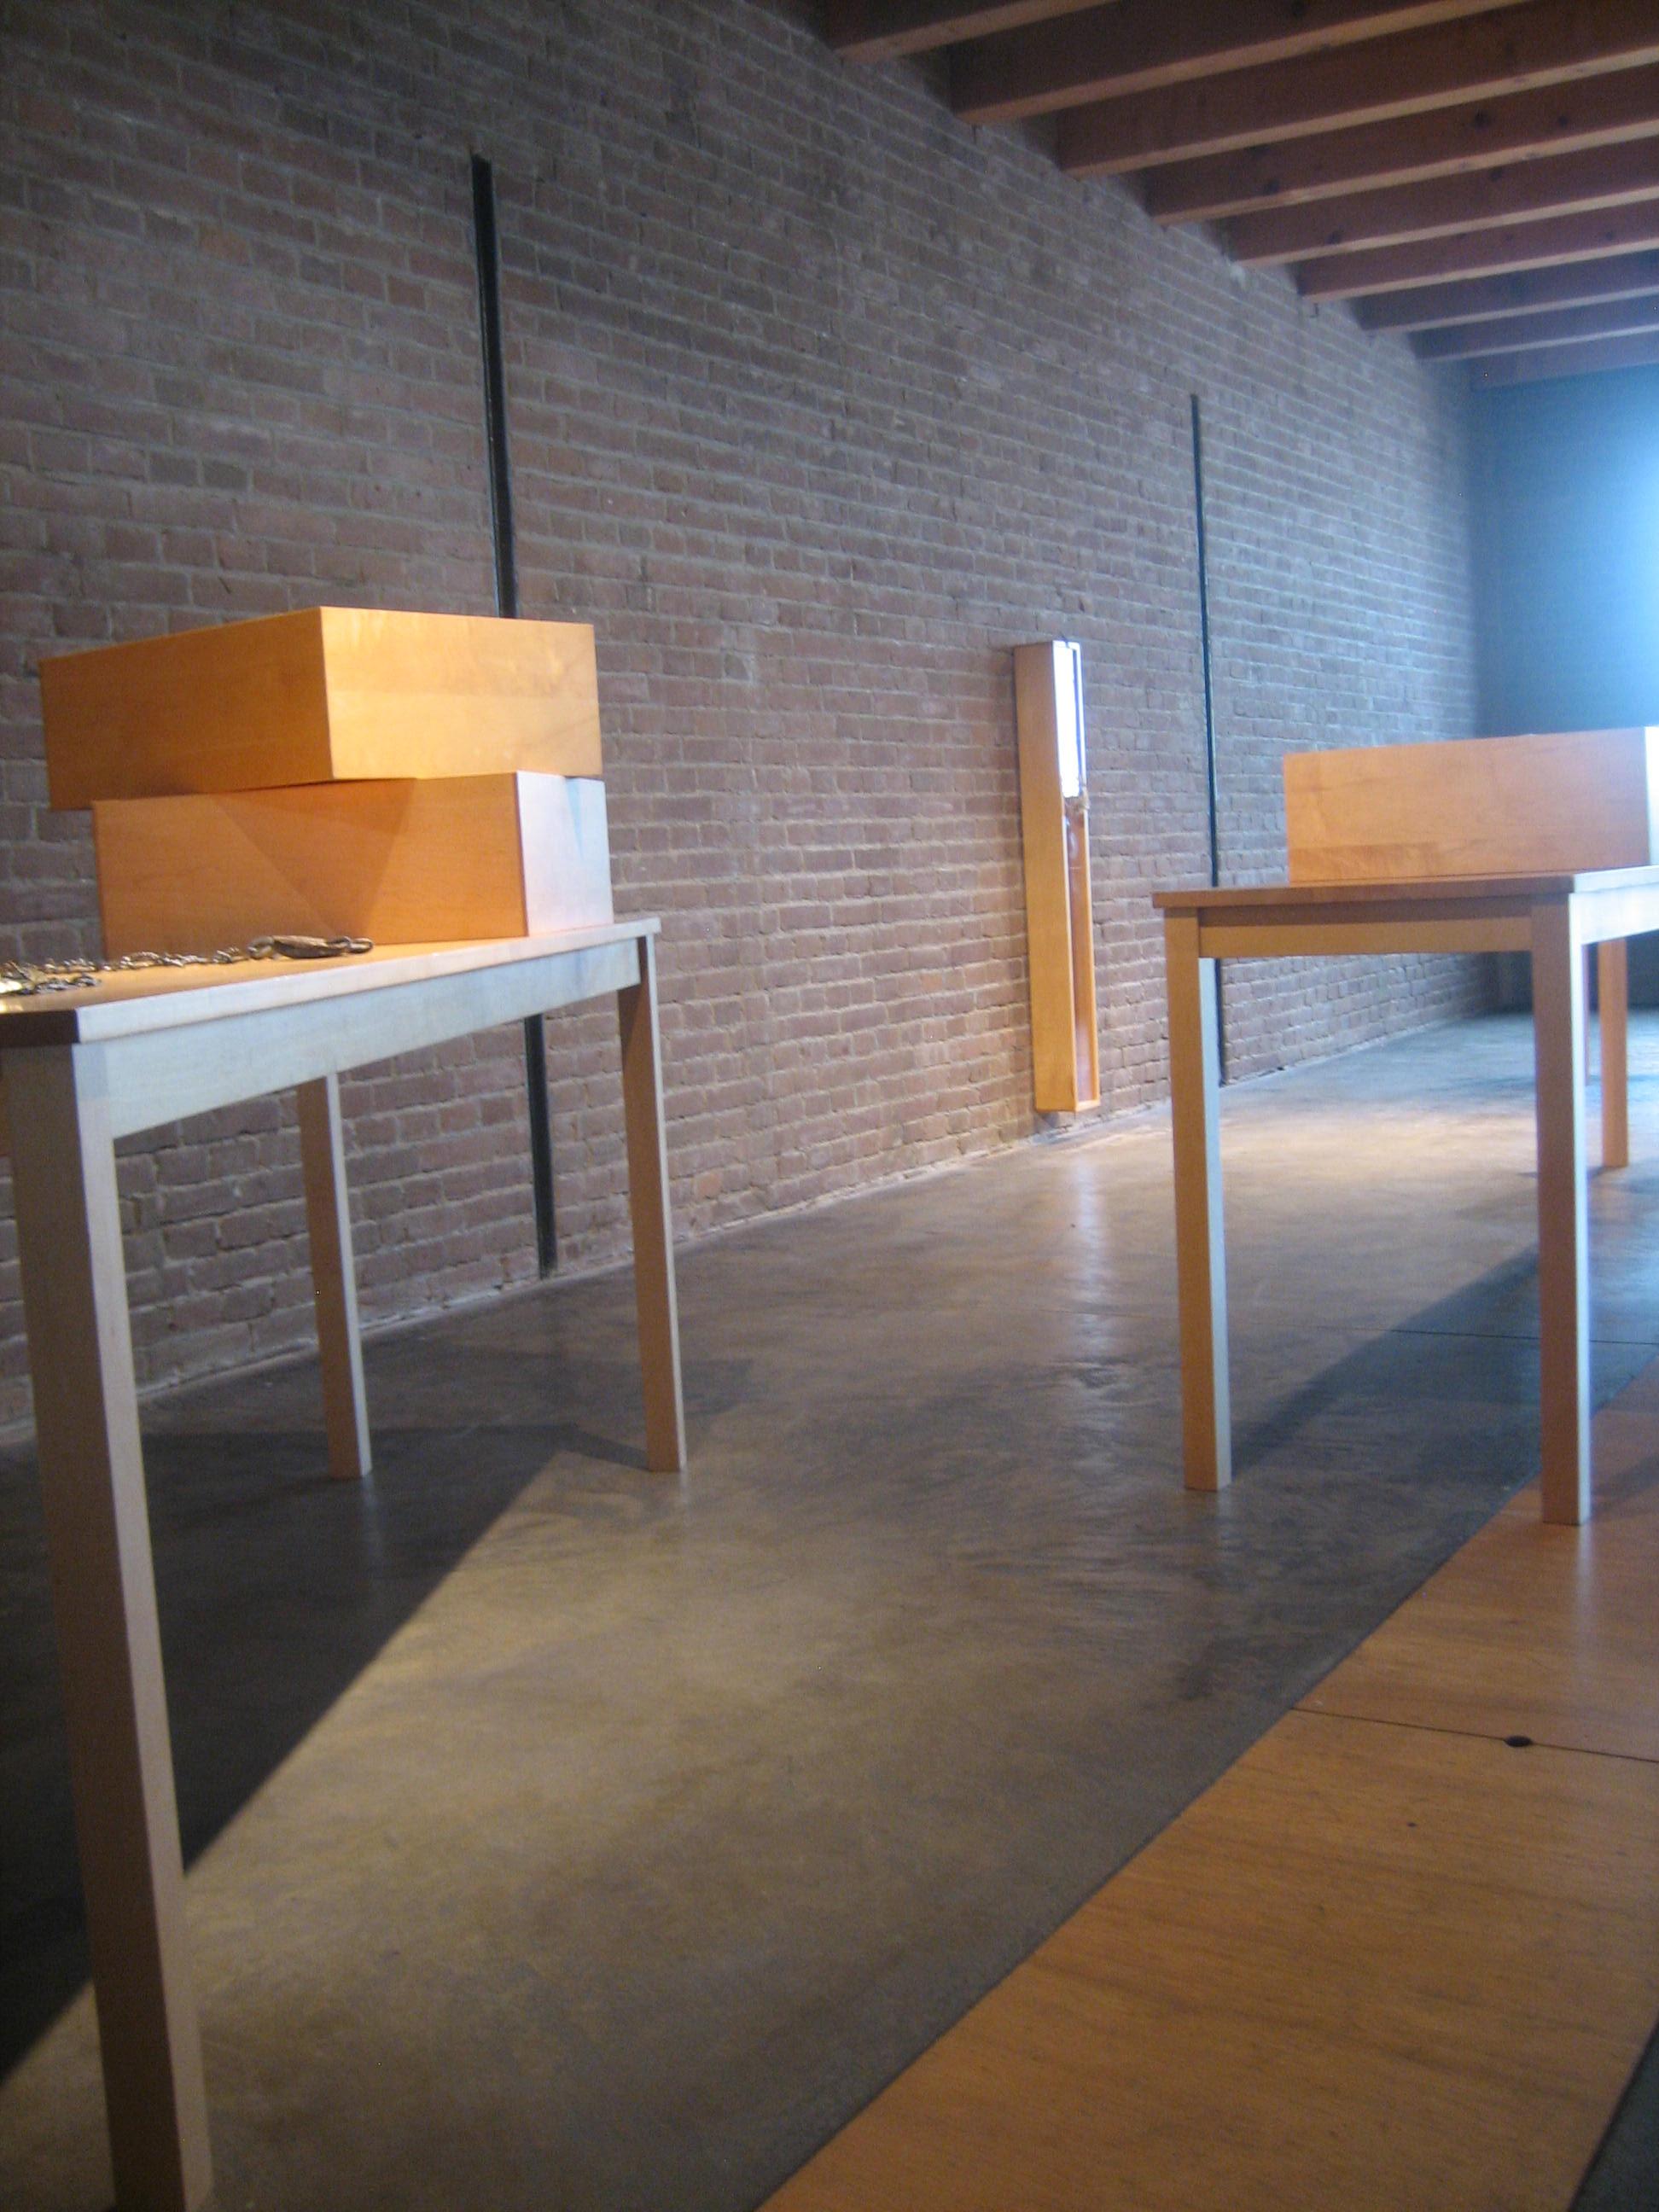 Rudolf Kocéa, Galerie Marzee, 2018. Foto Esther Doornbusch, juli 2018©